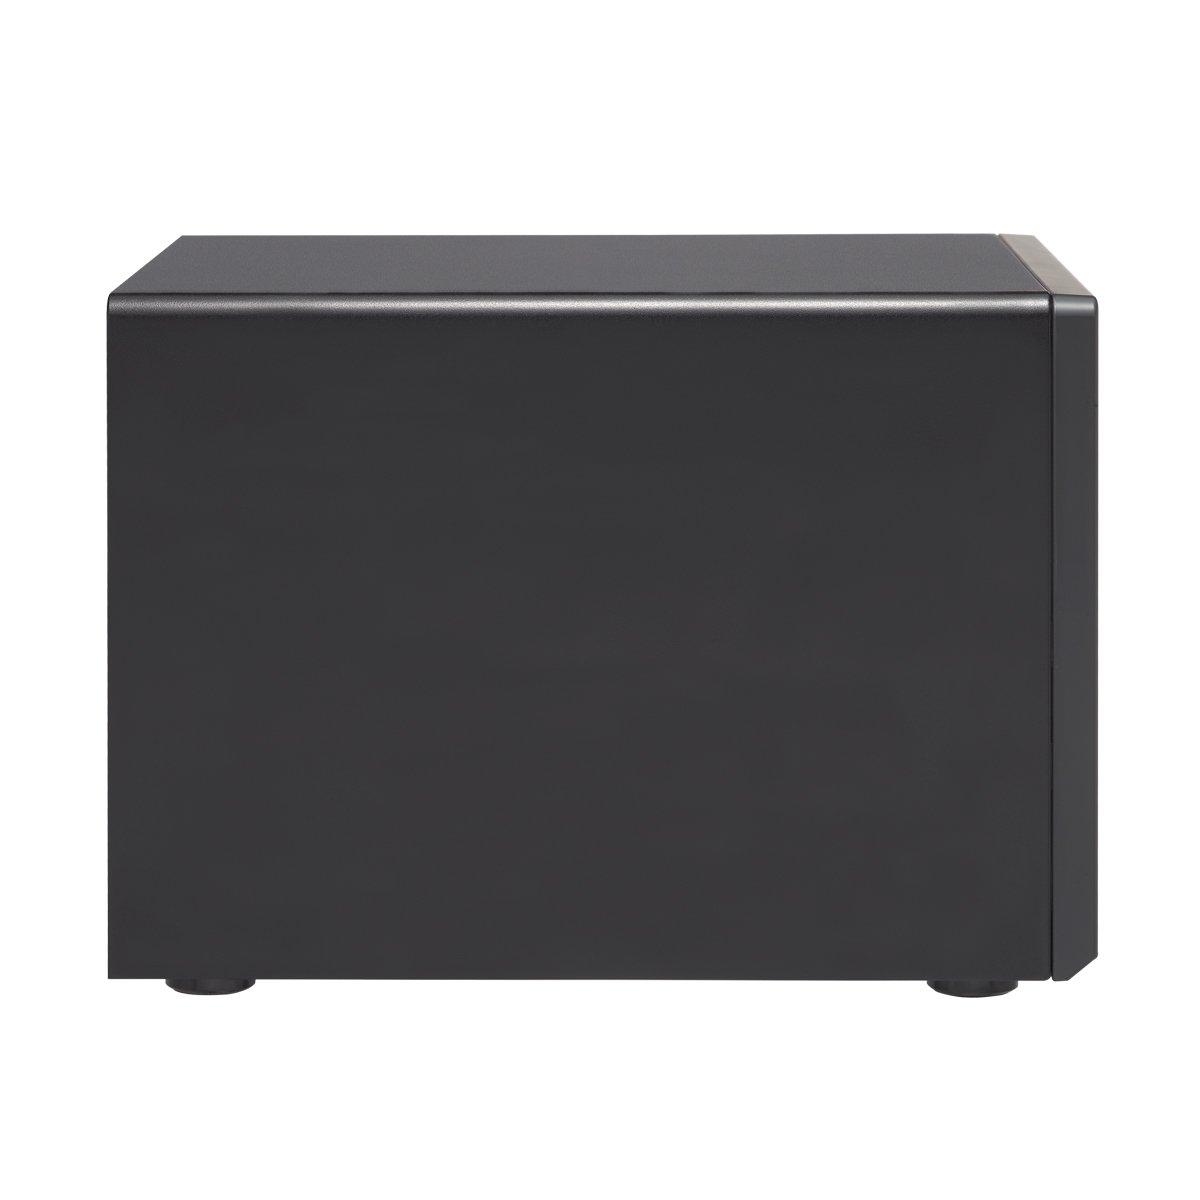 Qnap TVS-1282T3-i7-64G-US Ultra-High Speed 12 bay (8+4) Thunderbolt 3 NAS/iSCSI IP-SAN, Intel 7th Gen Kaby Lake Core i7 3.6GHz Quad Core, 64GB RAM, Thunderbolt3 port x 4 and 10Gbase-T x 2 by QNAP (Image #3)